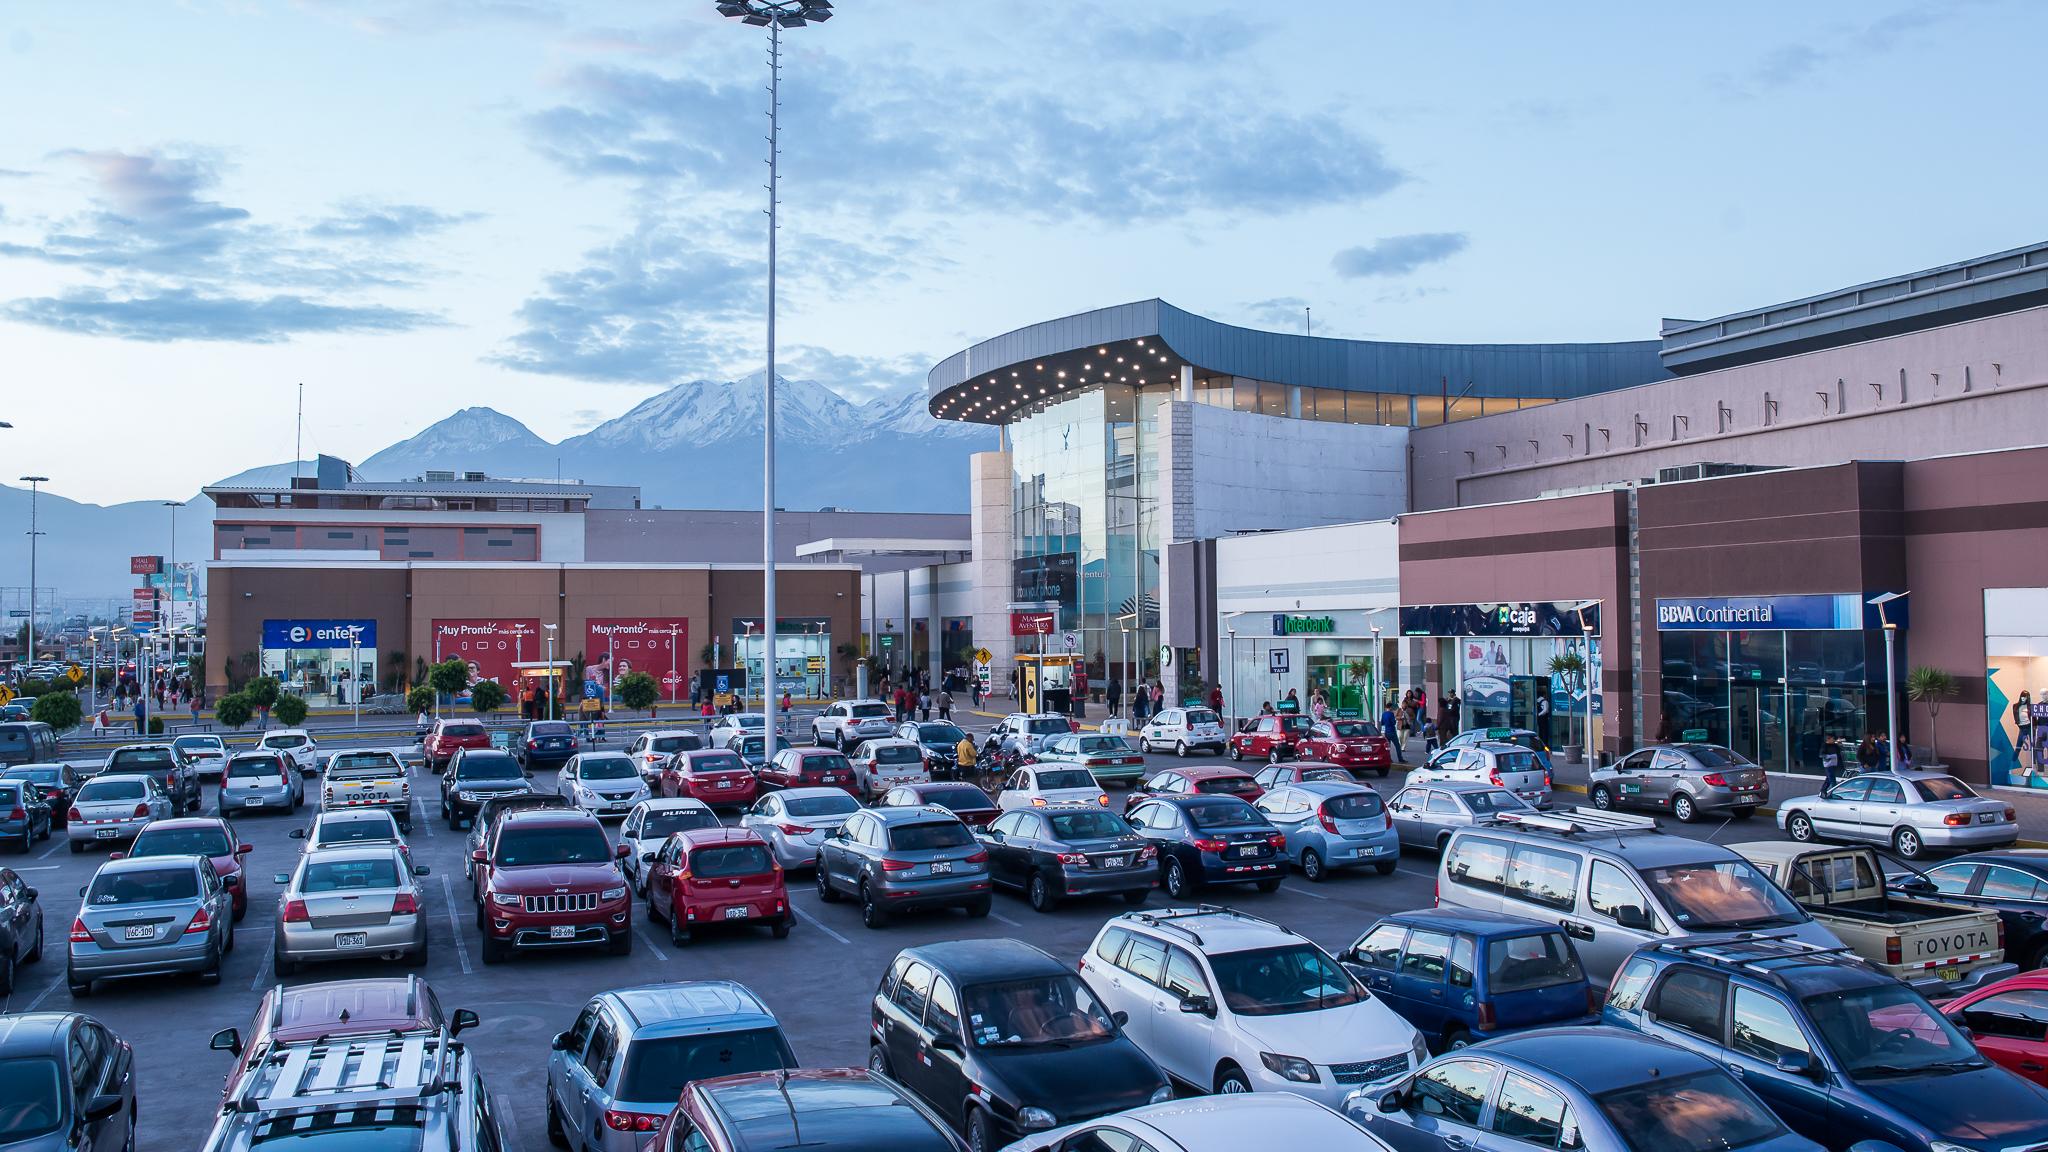 Mall Aventura Arequipa - Mall Aventura Arequipa invertirá S/ 45 millones para ampliación